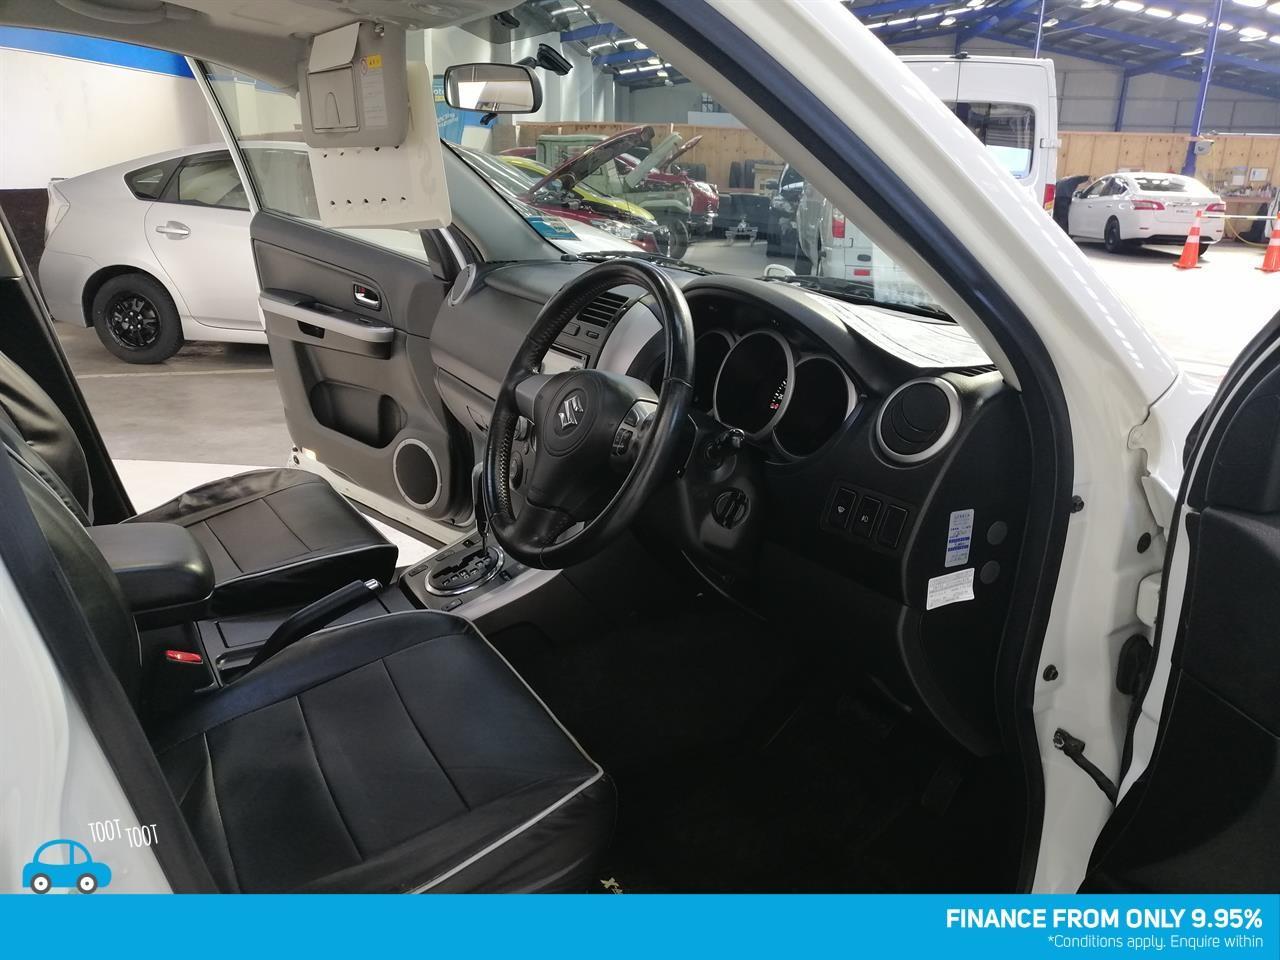 image-11, 2013 Suzuki ESCUDO CROSS ADVENTURE at Dunedin